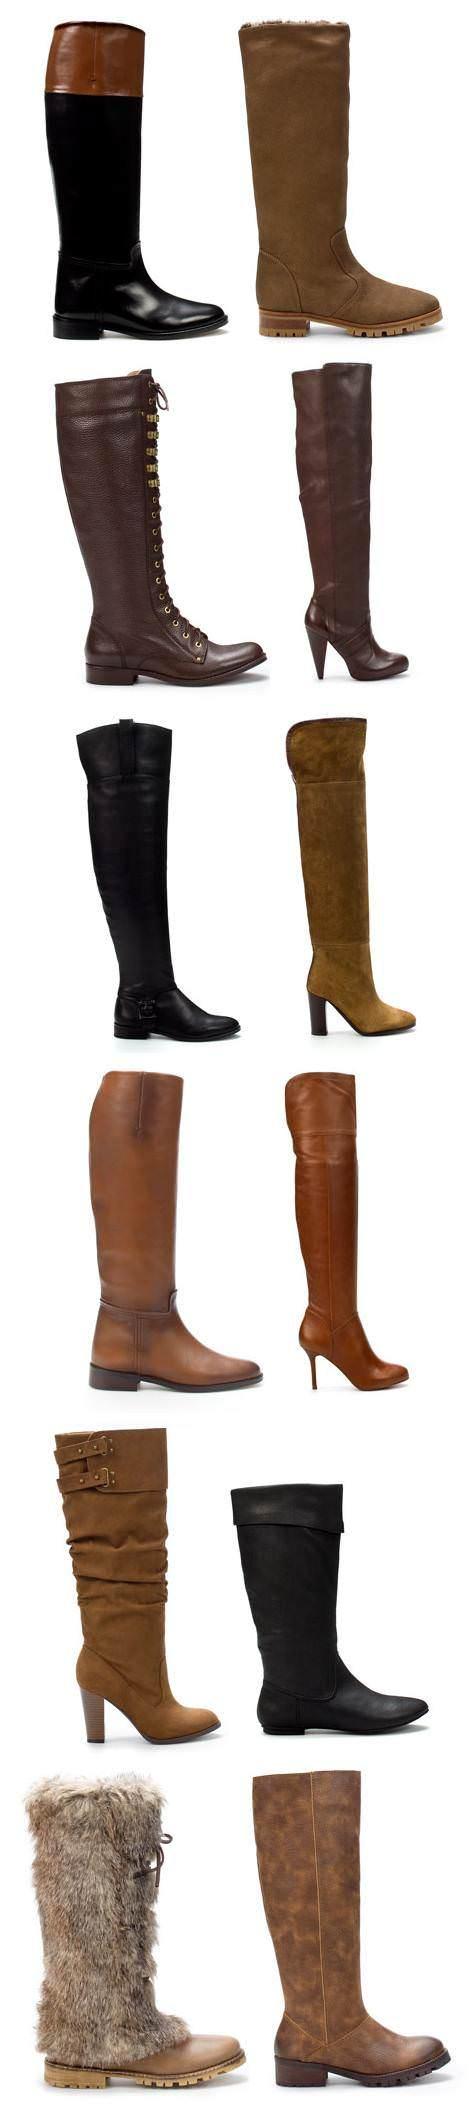 Botas de Zara (moda otoño invierno 2010 2011)